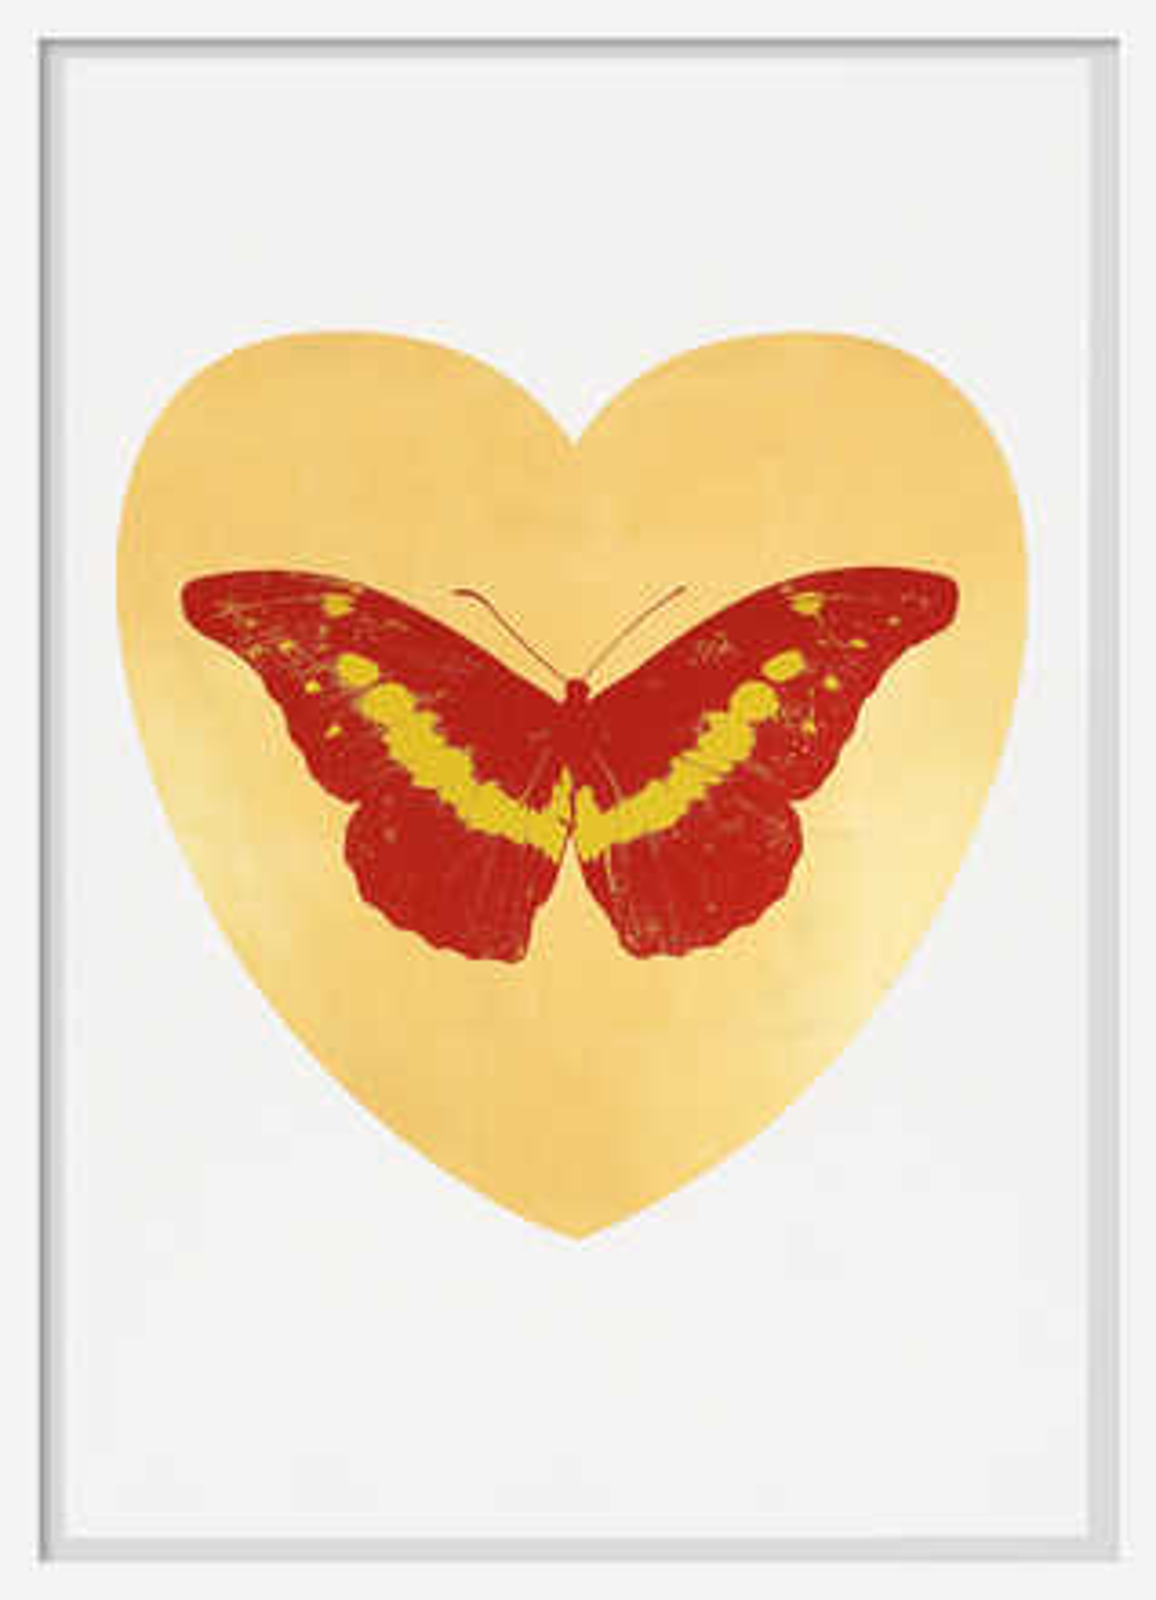 I Love You - gold leaf, poppy red, oriental gold - Damien Hirst